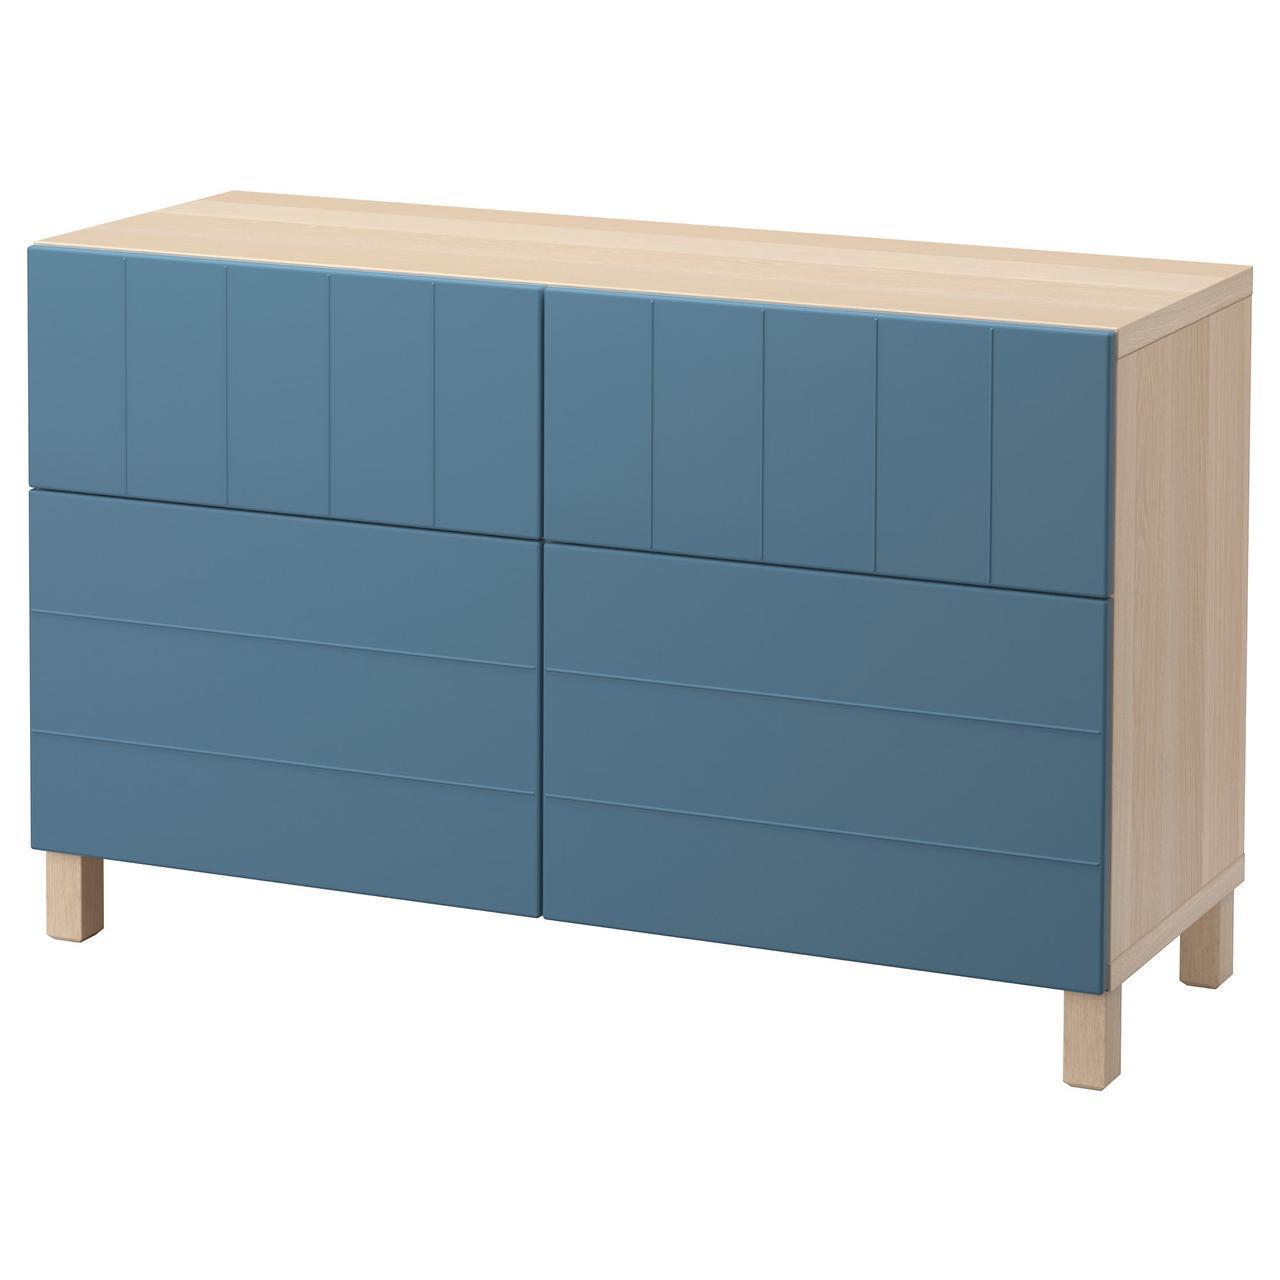 Тумба IKEA BESTÅ 120x40x74 см Hallstavik беленый дуб темно-синяя 992.061.44